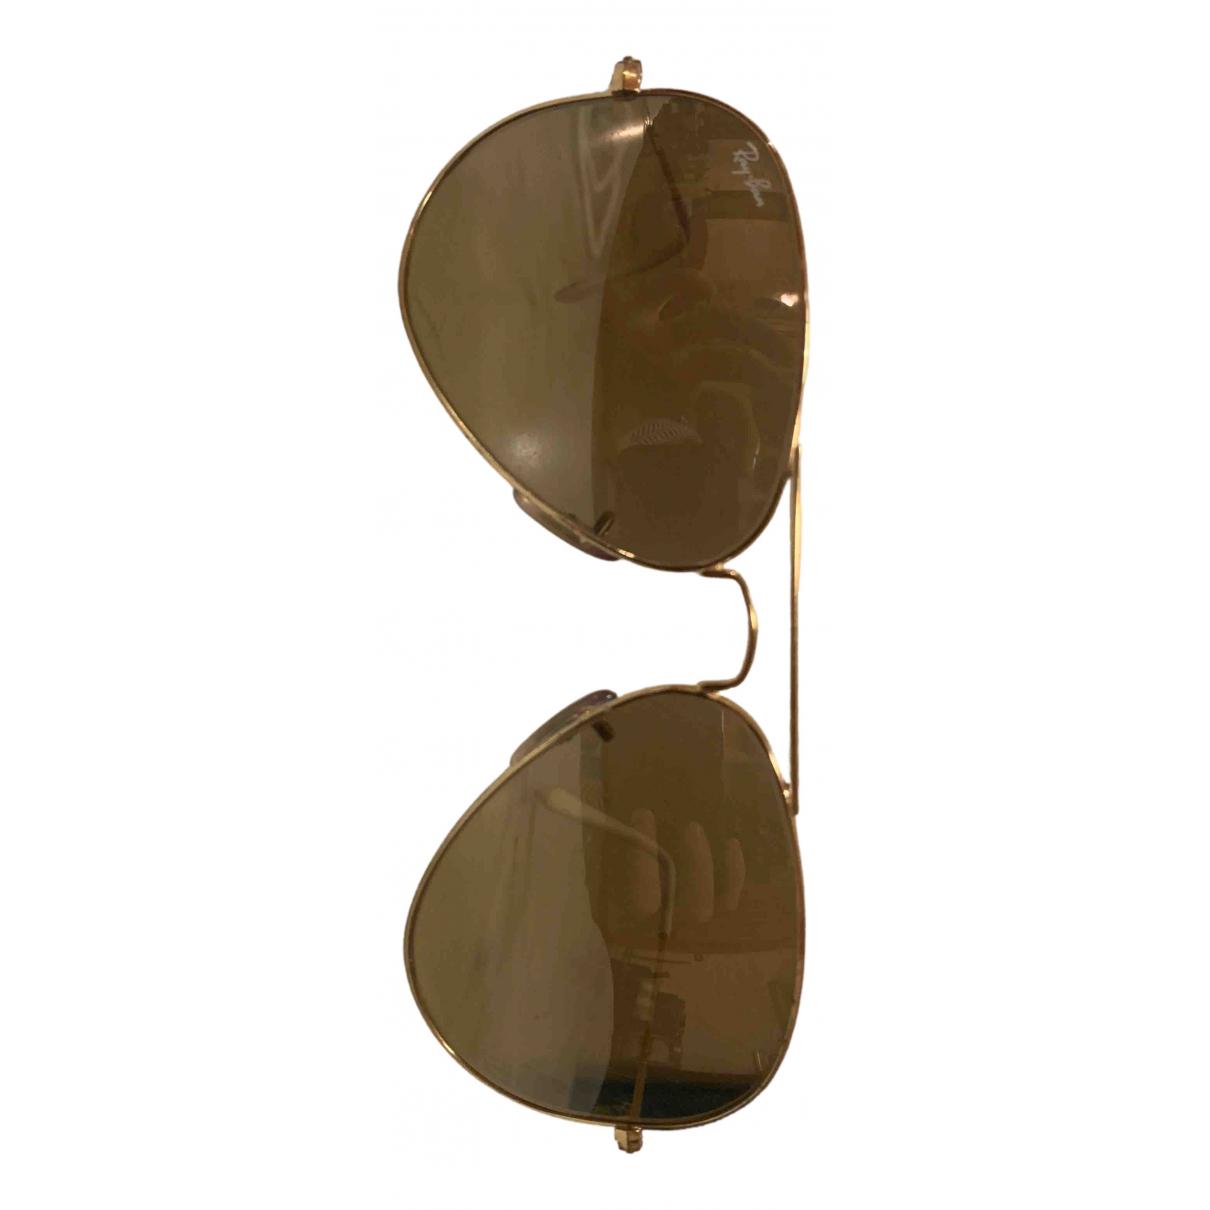 Ray-ban Aviator Metallic Metal Sunglasses for Women N